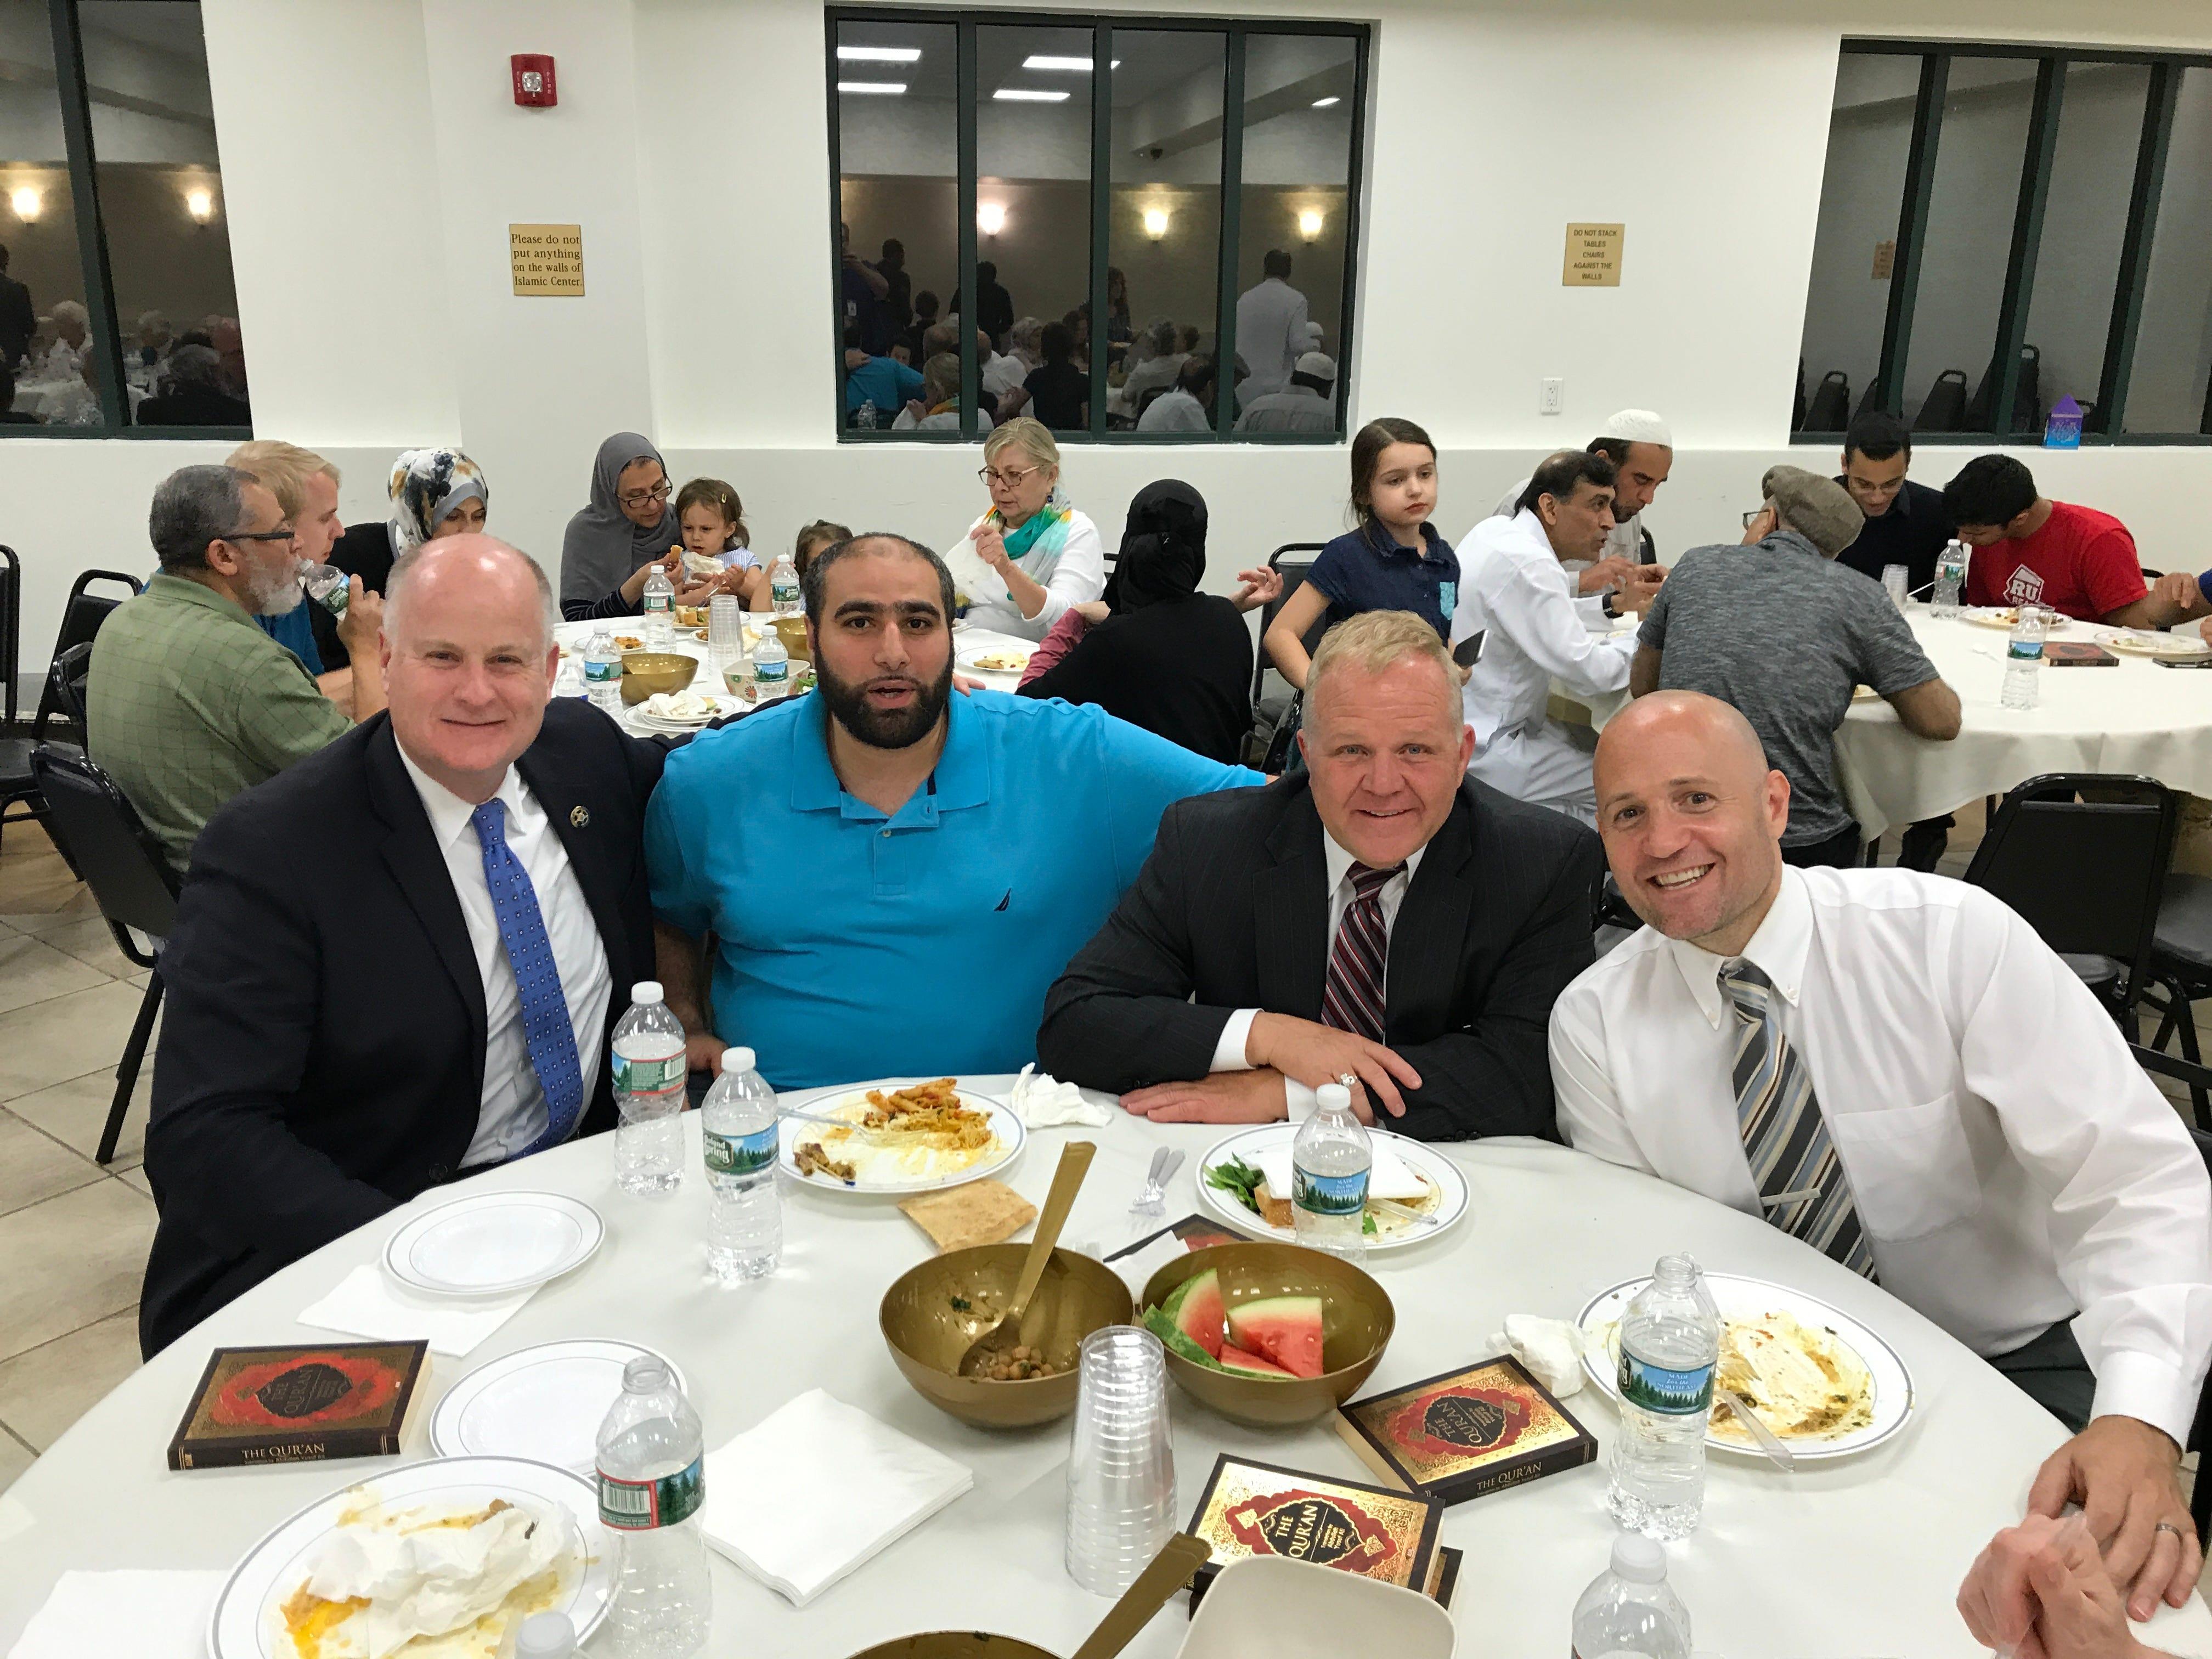 Iftar dinner breaks Ramadan fast in Boonton